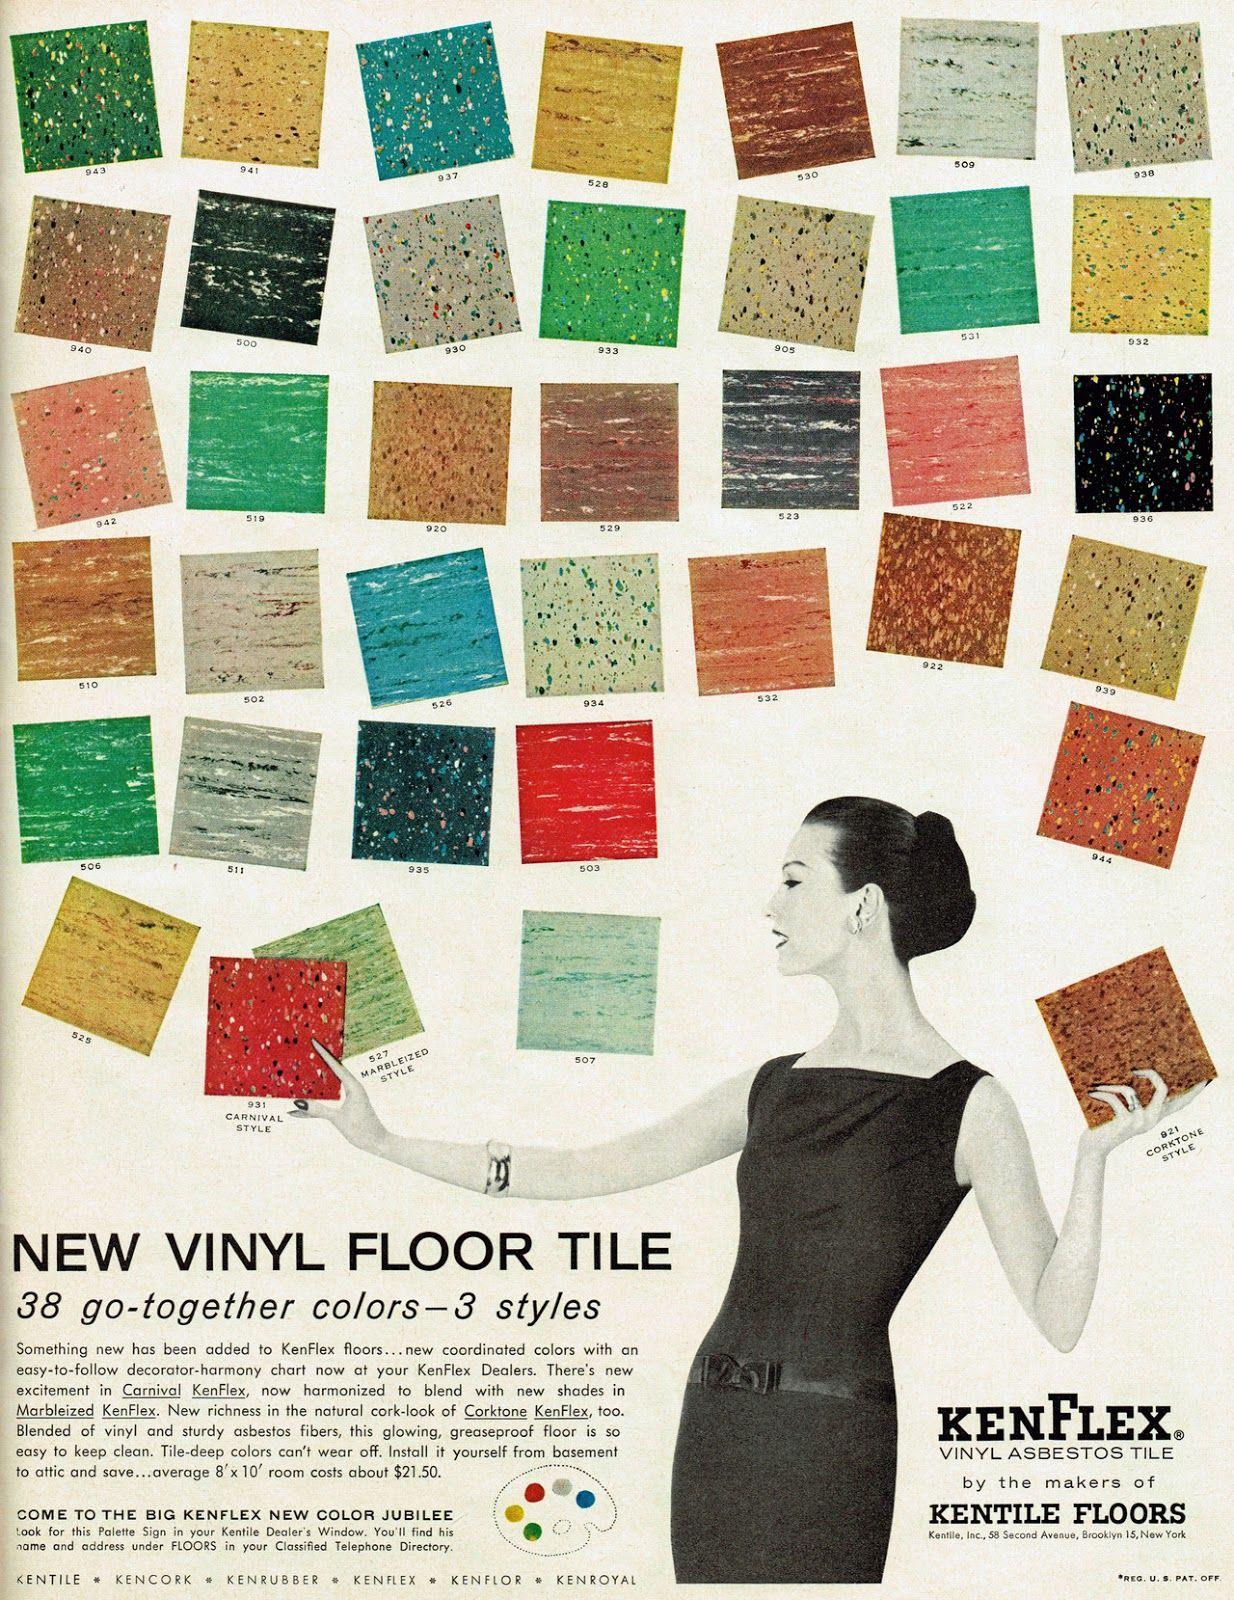 Librarian Tells All Vintage Floor Tile is To Die For